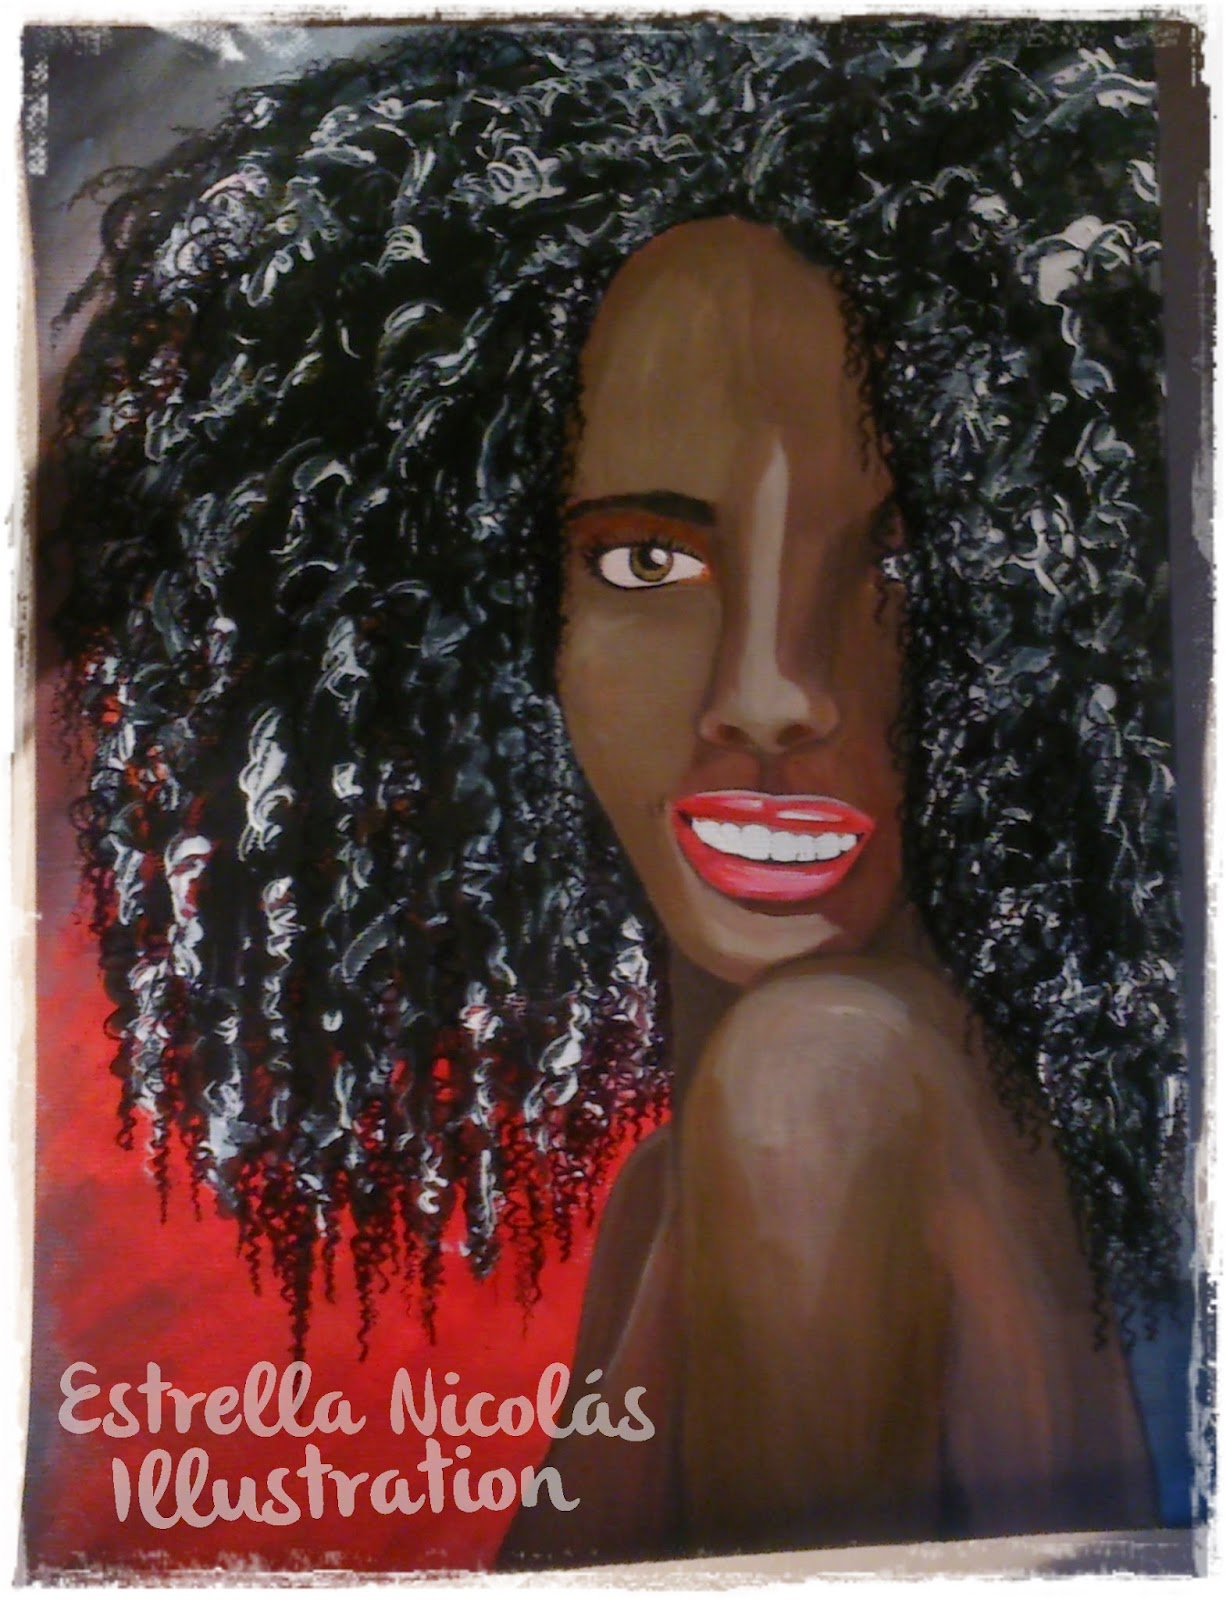 retrato mujer negra, acrilico, rojo, cara sonriendo